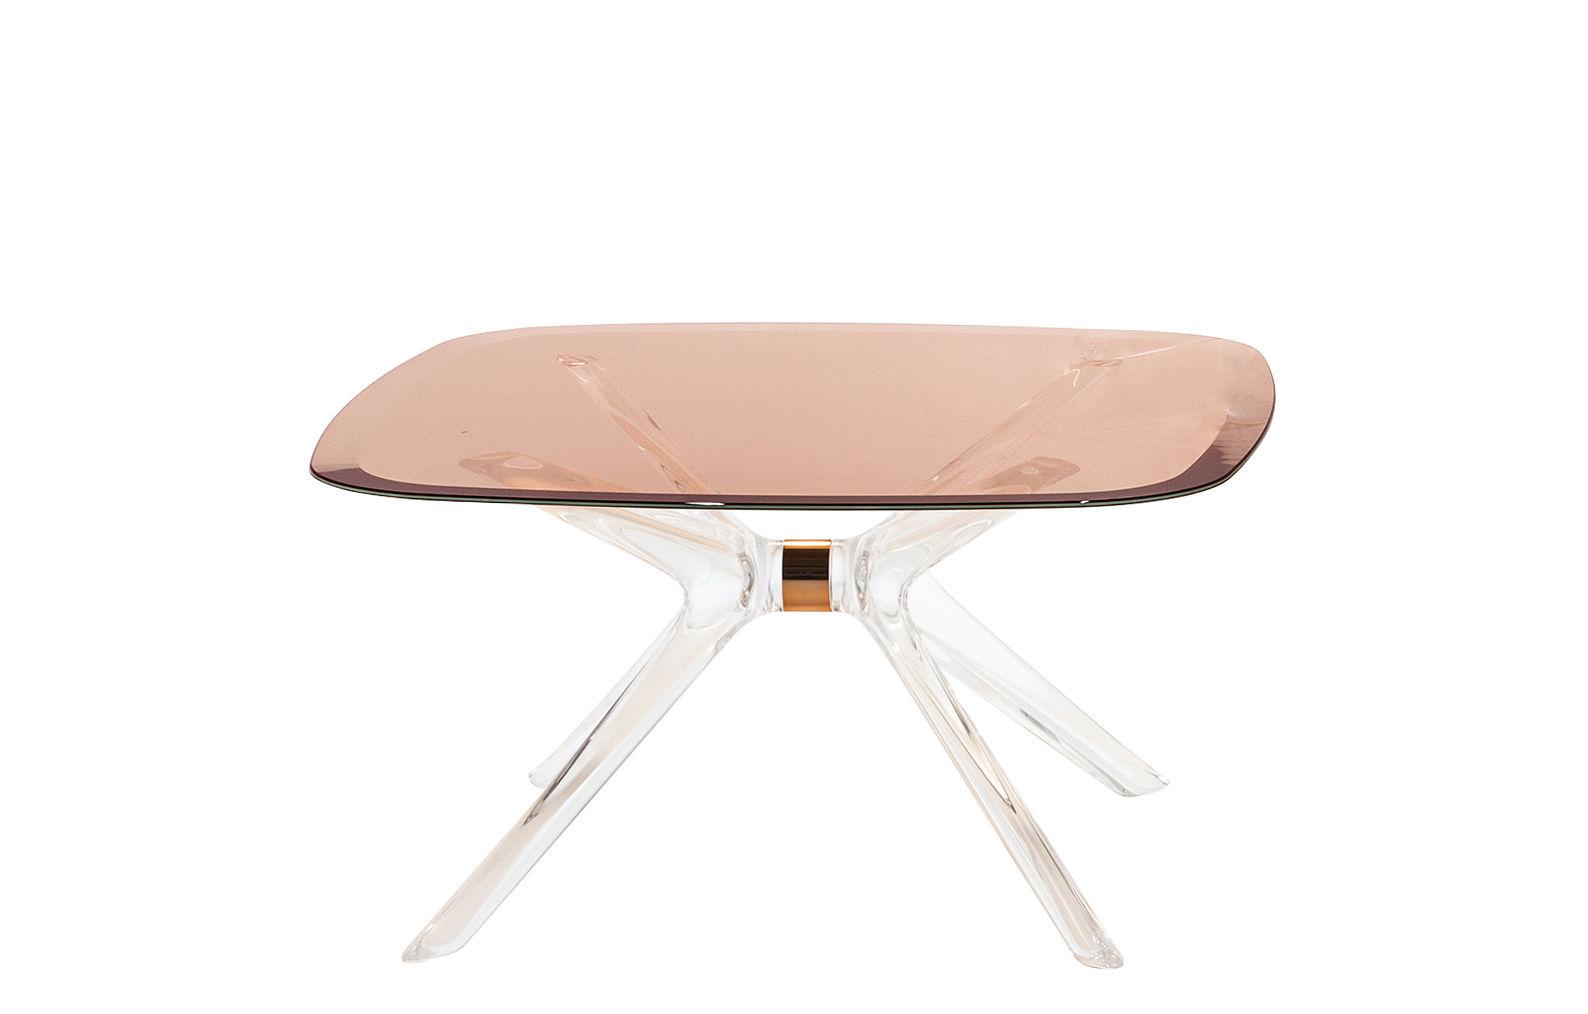 Mobilier - Tables basses - Table basse Blast / Verre - 80 x 80 cm - Kartell - Rose / Transparent - Aluminium, Cristal, Technopolymère thermoplastique